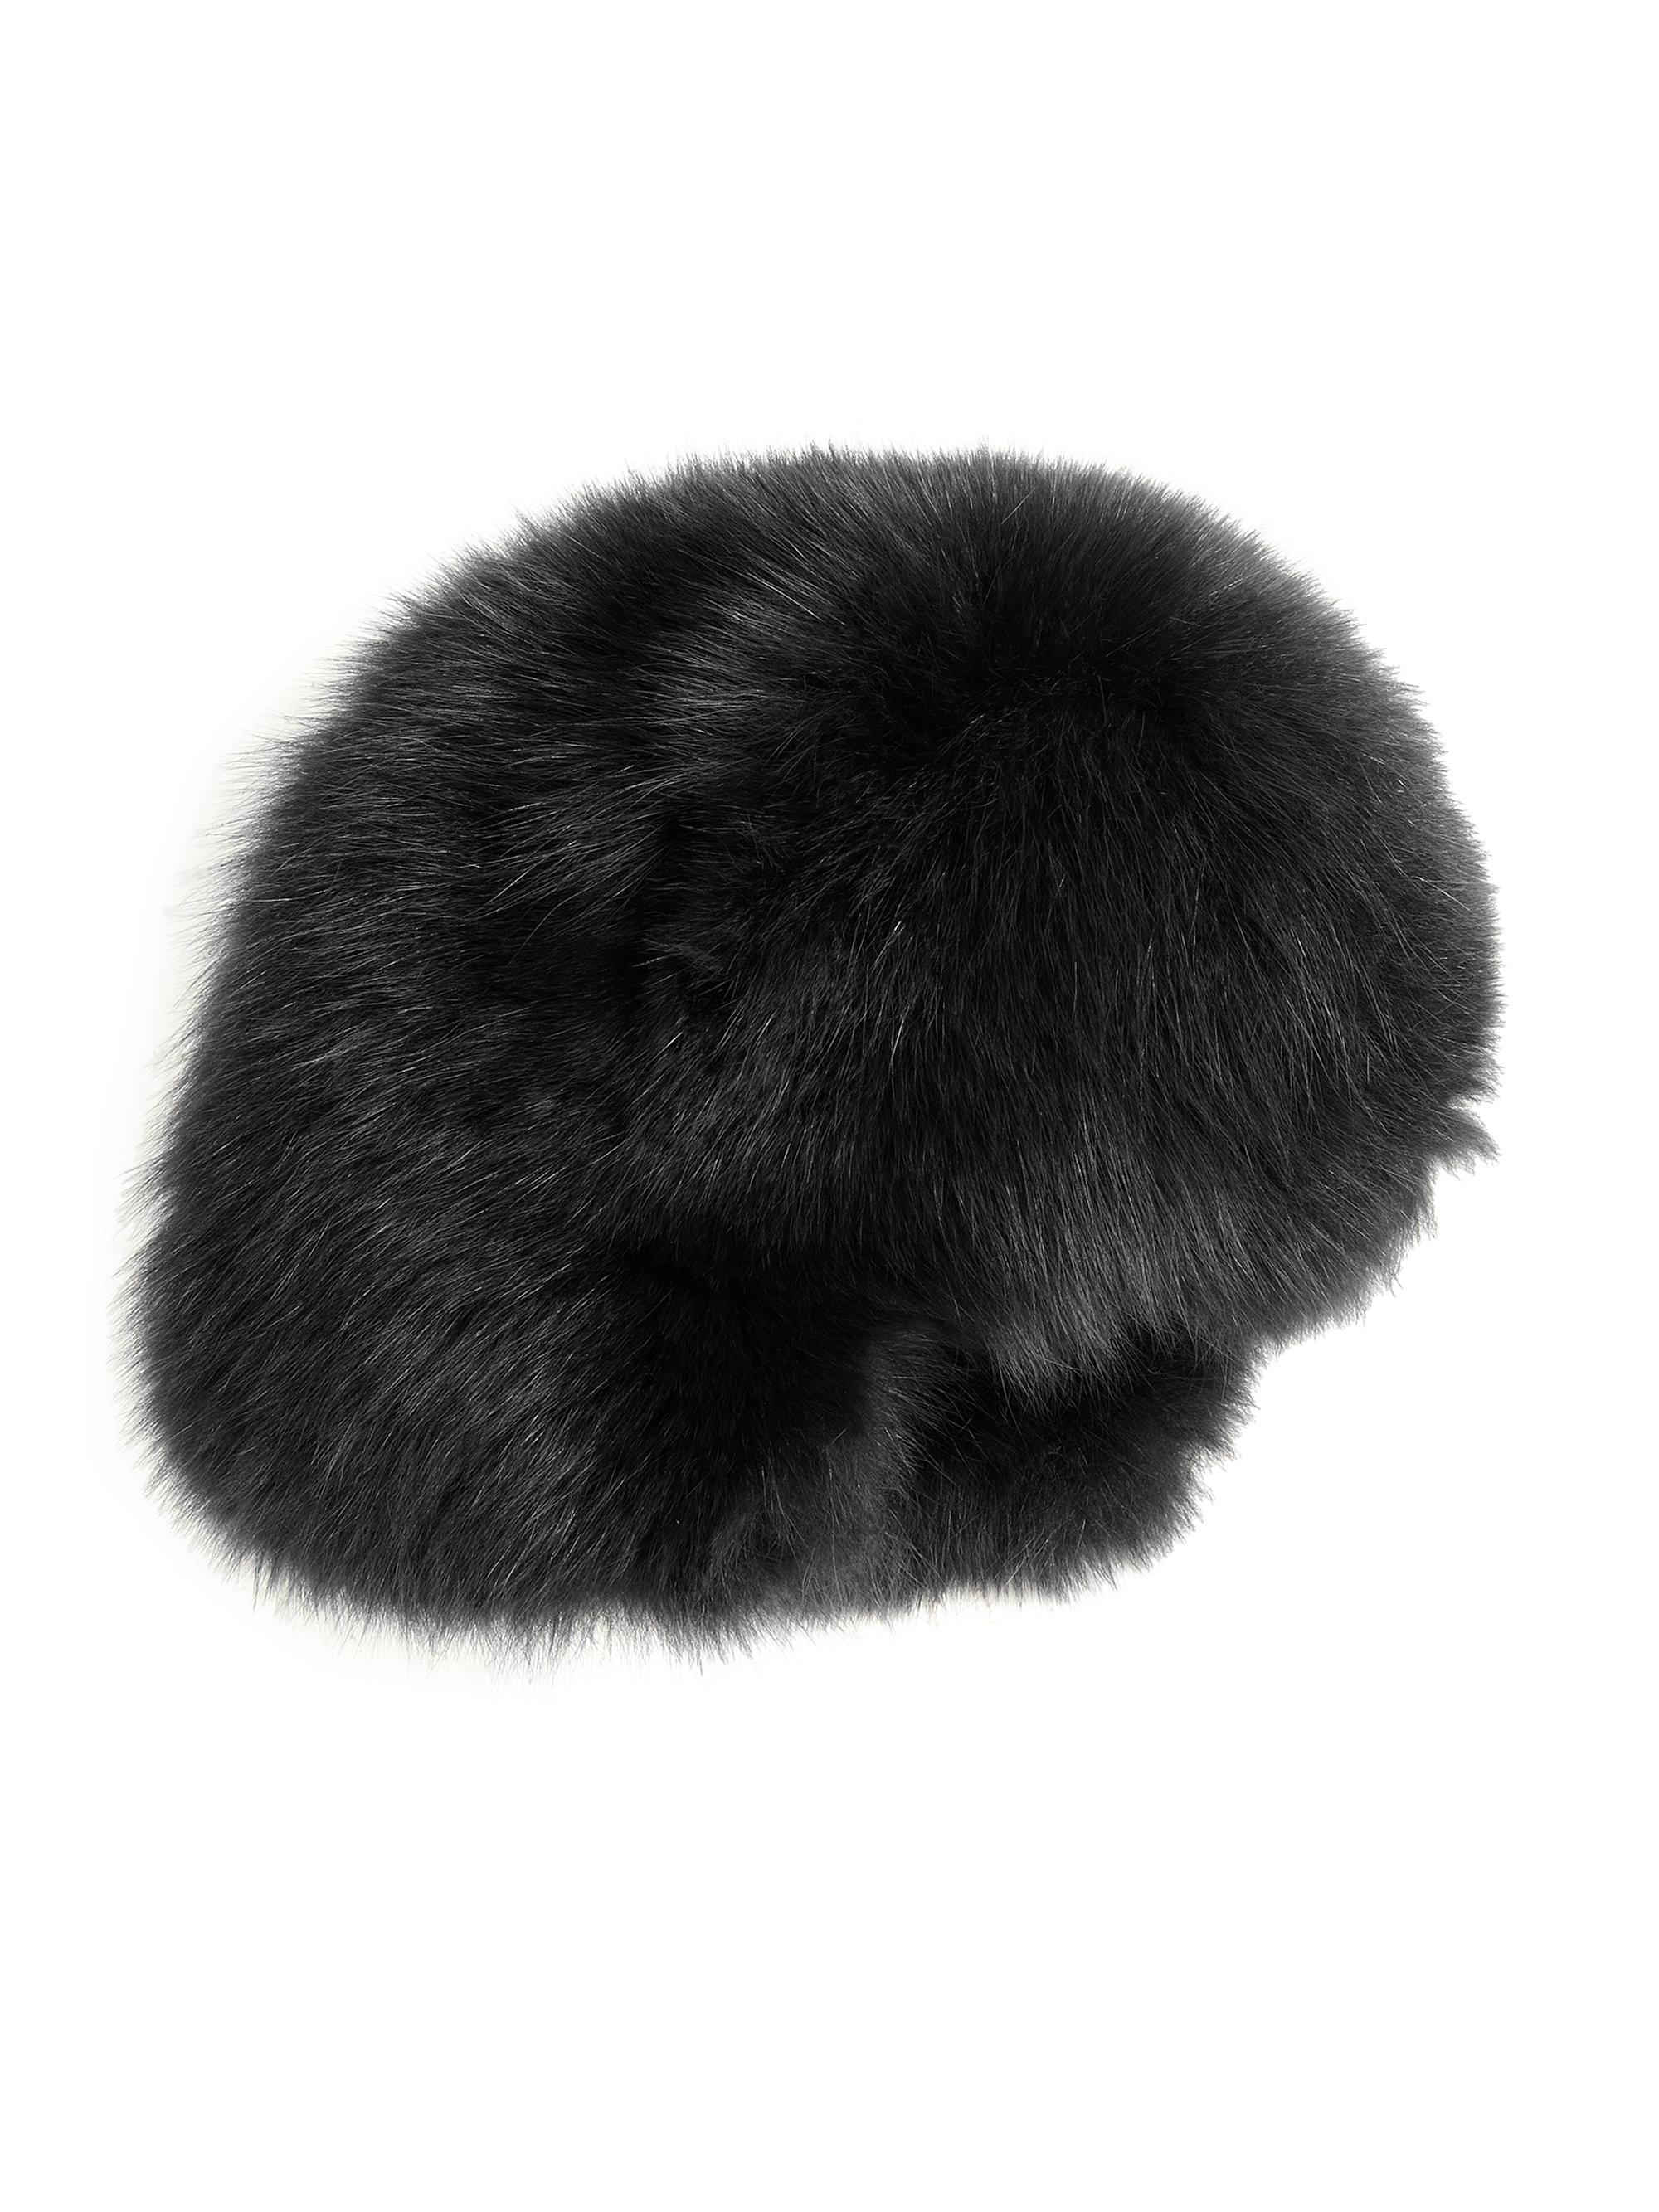 Lyst - Moncler Fur Hat in Black ea559f572a9